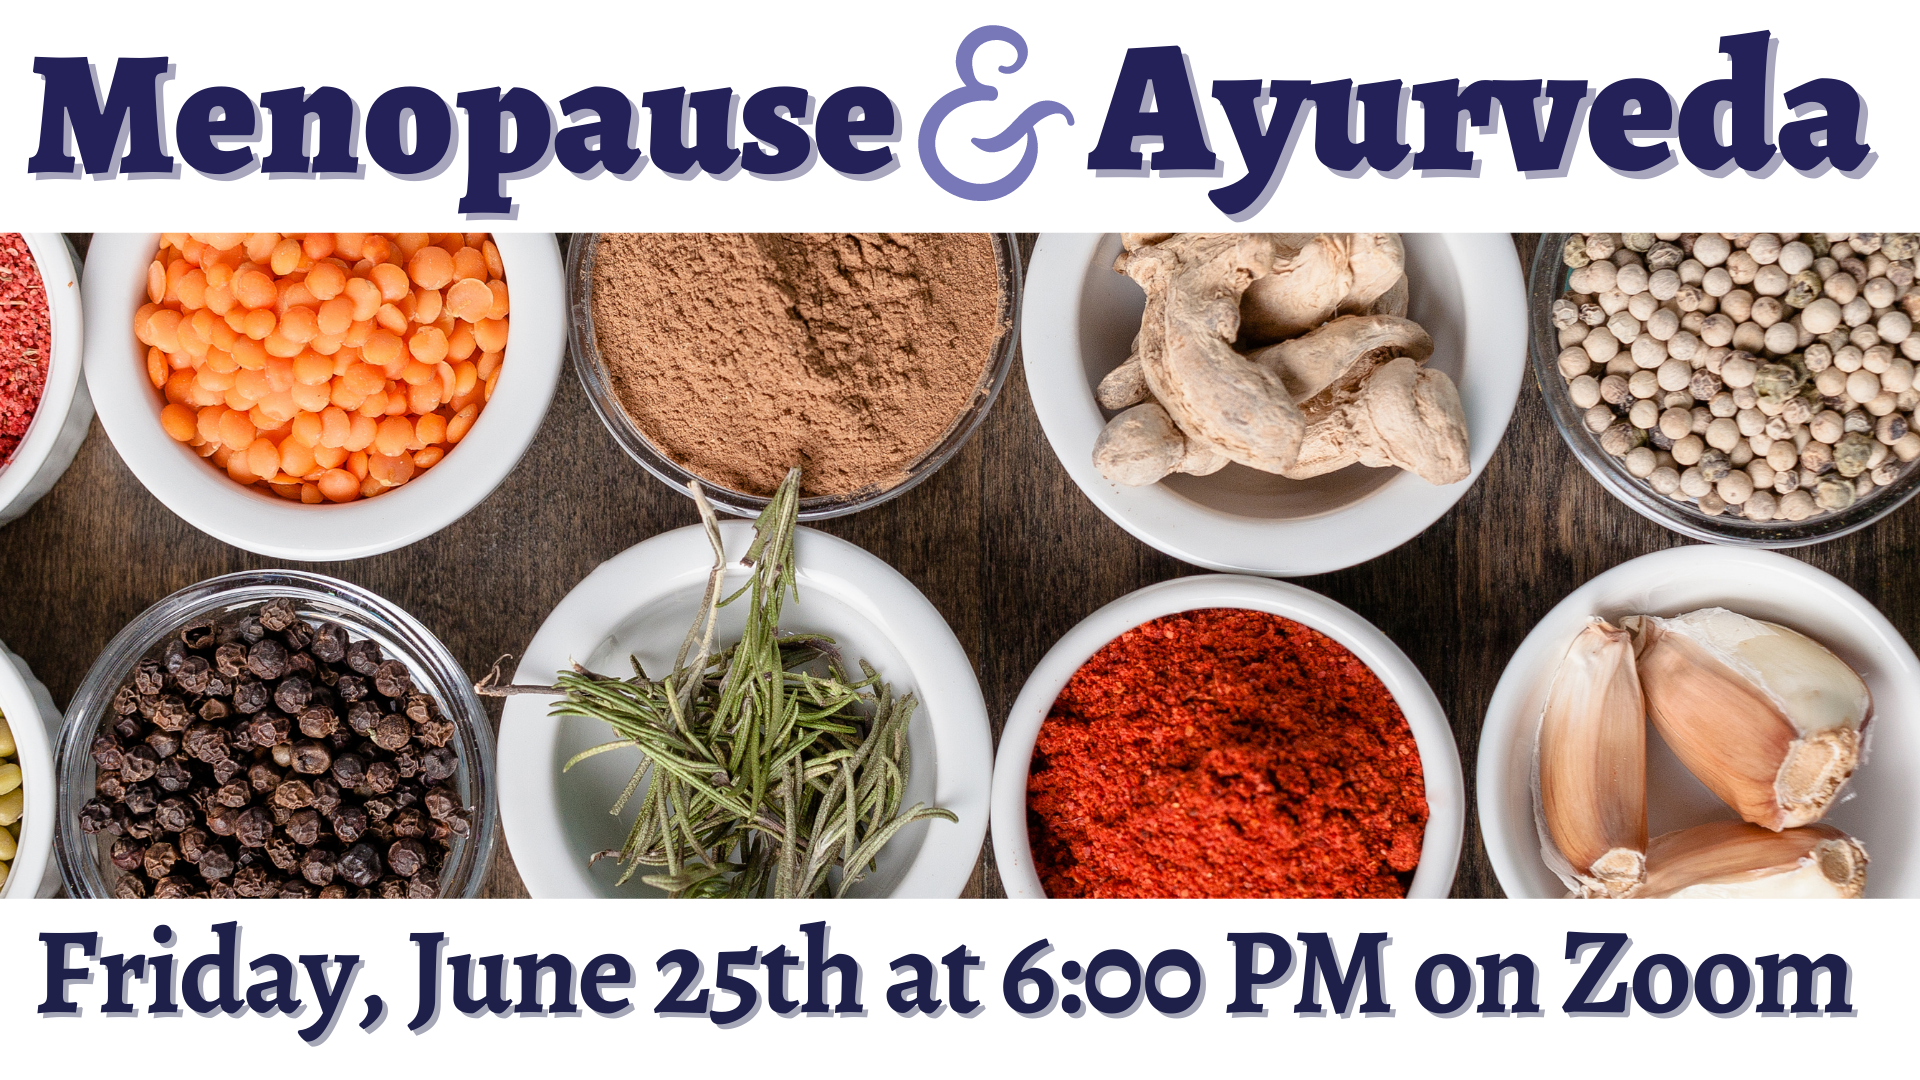 Menopause and Ayurveda